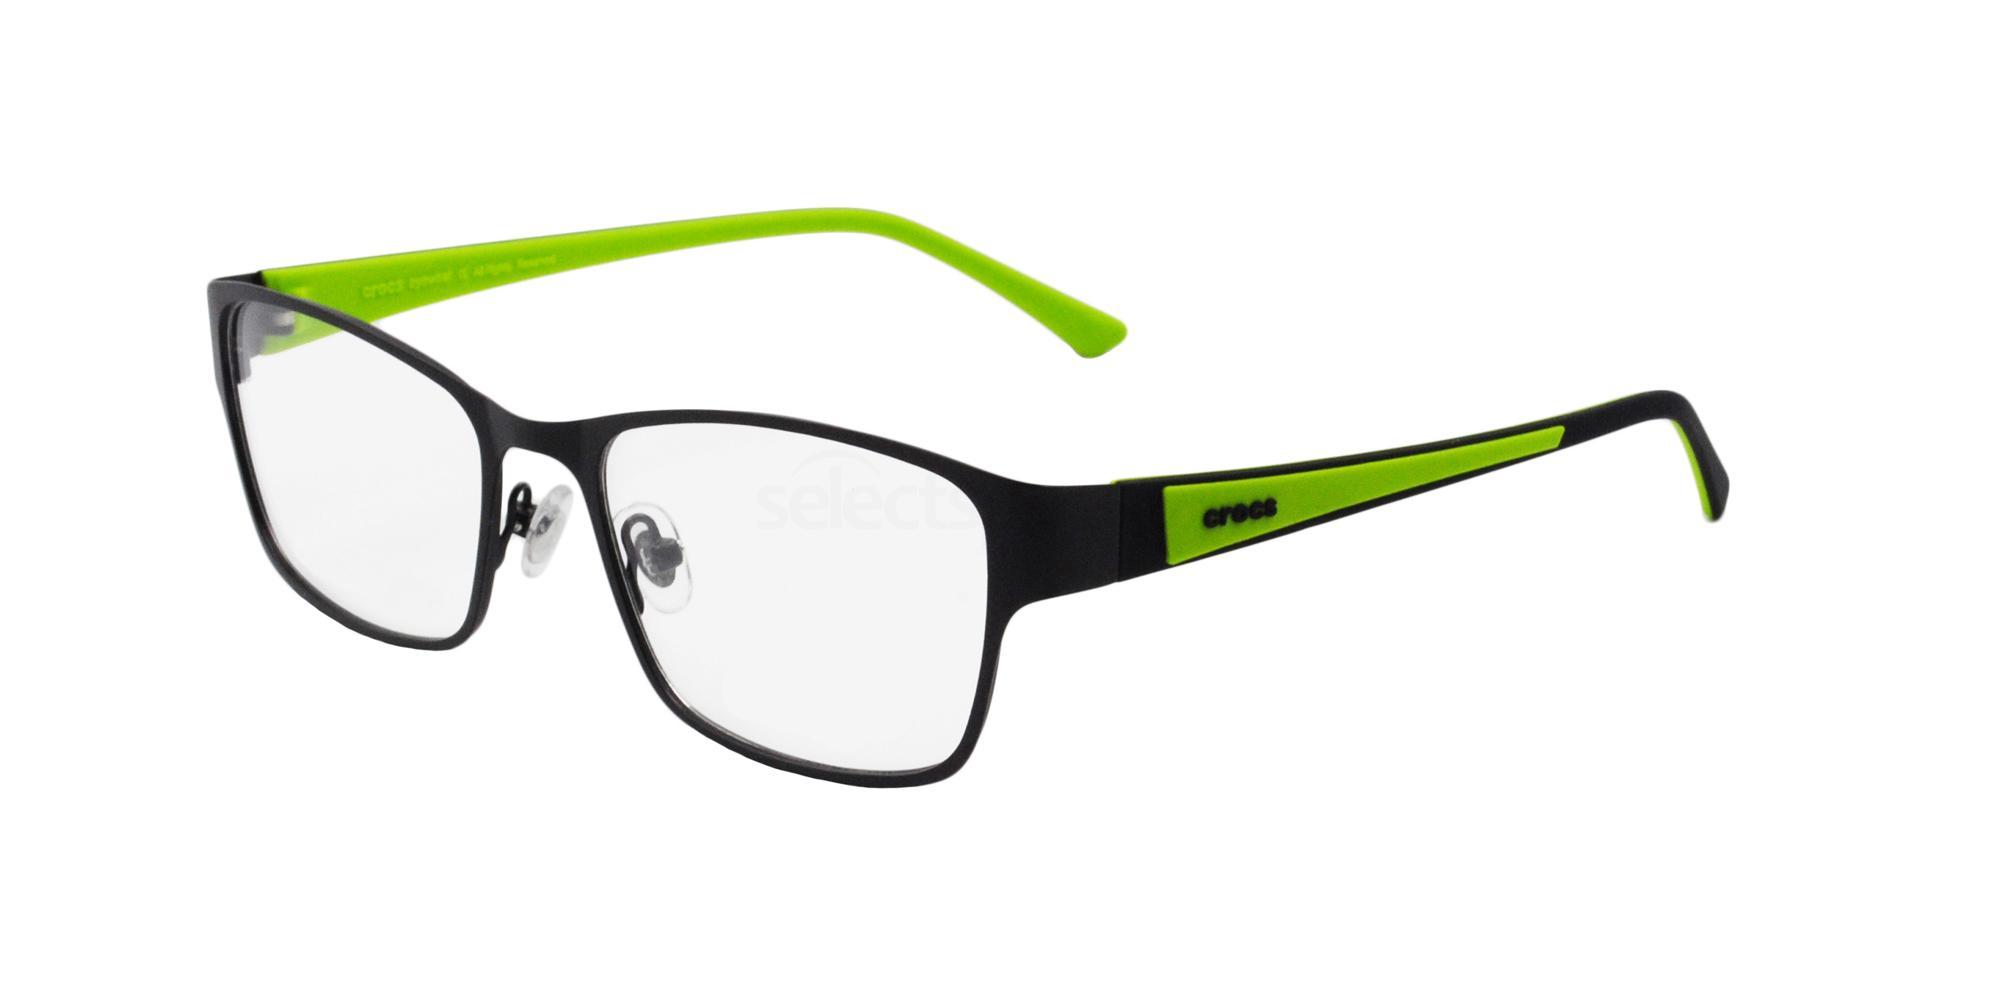 20GN CF 386 Glasses, Crocs Eyewear